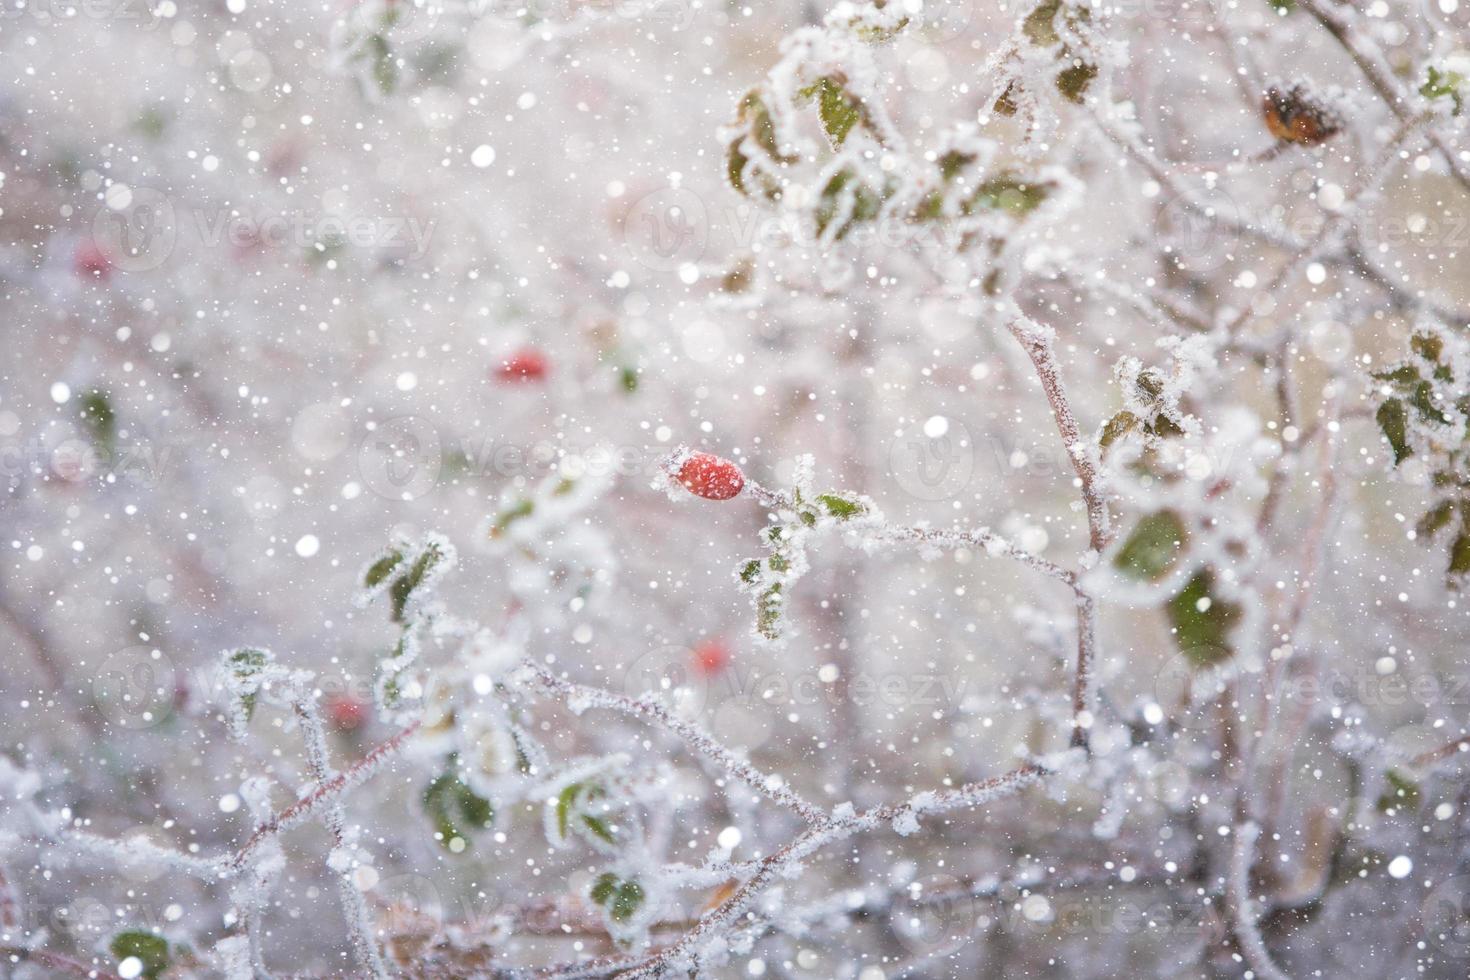 baies dans la neige photo